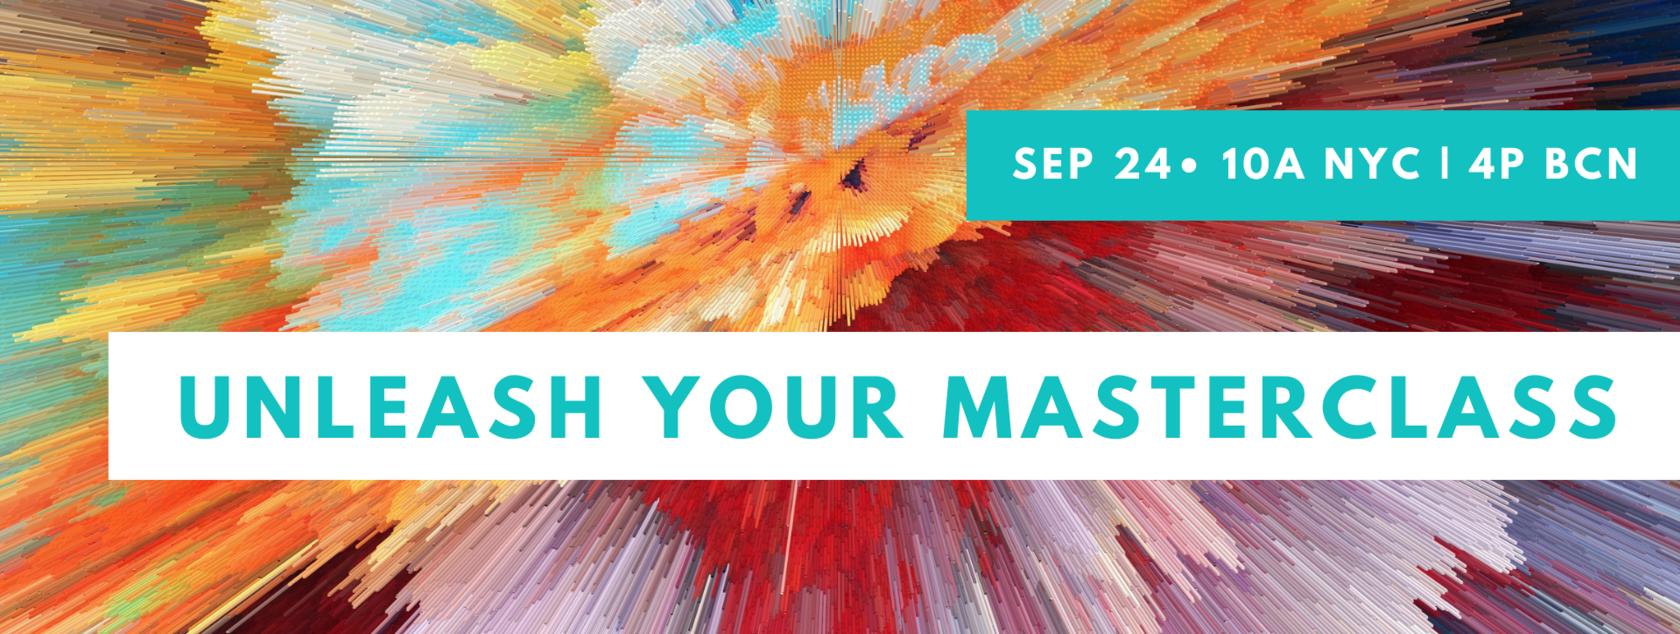 event-program-unleash-your-masterclass